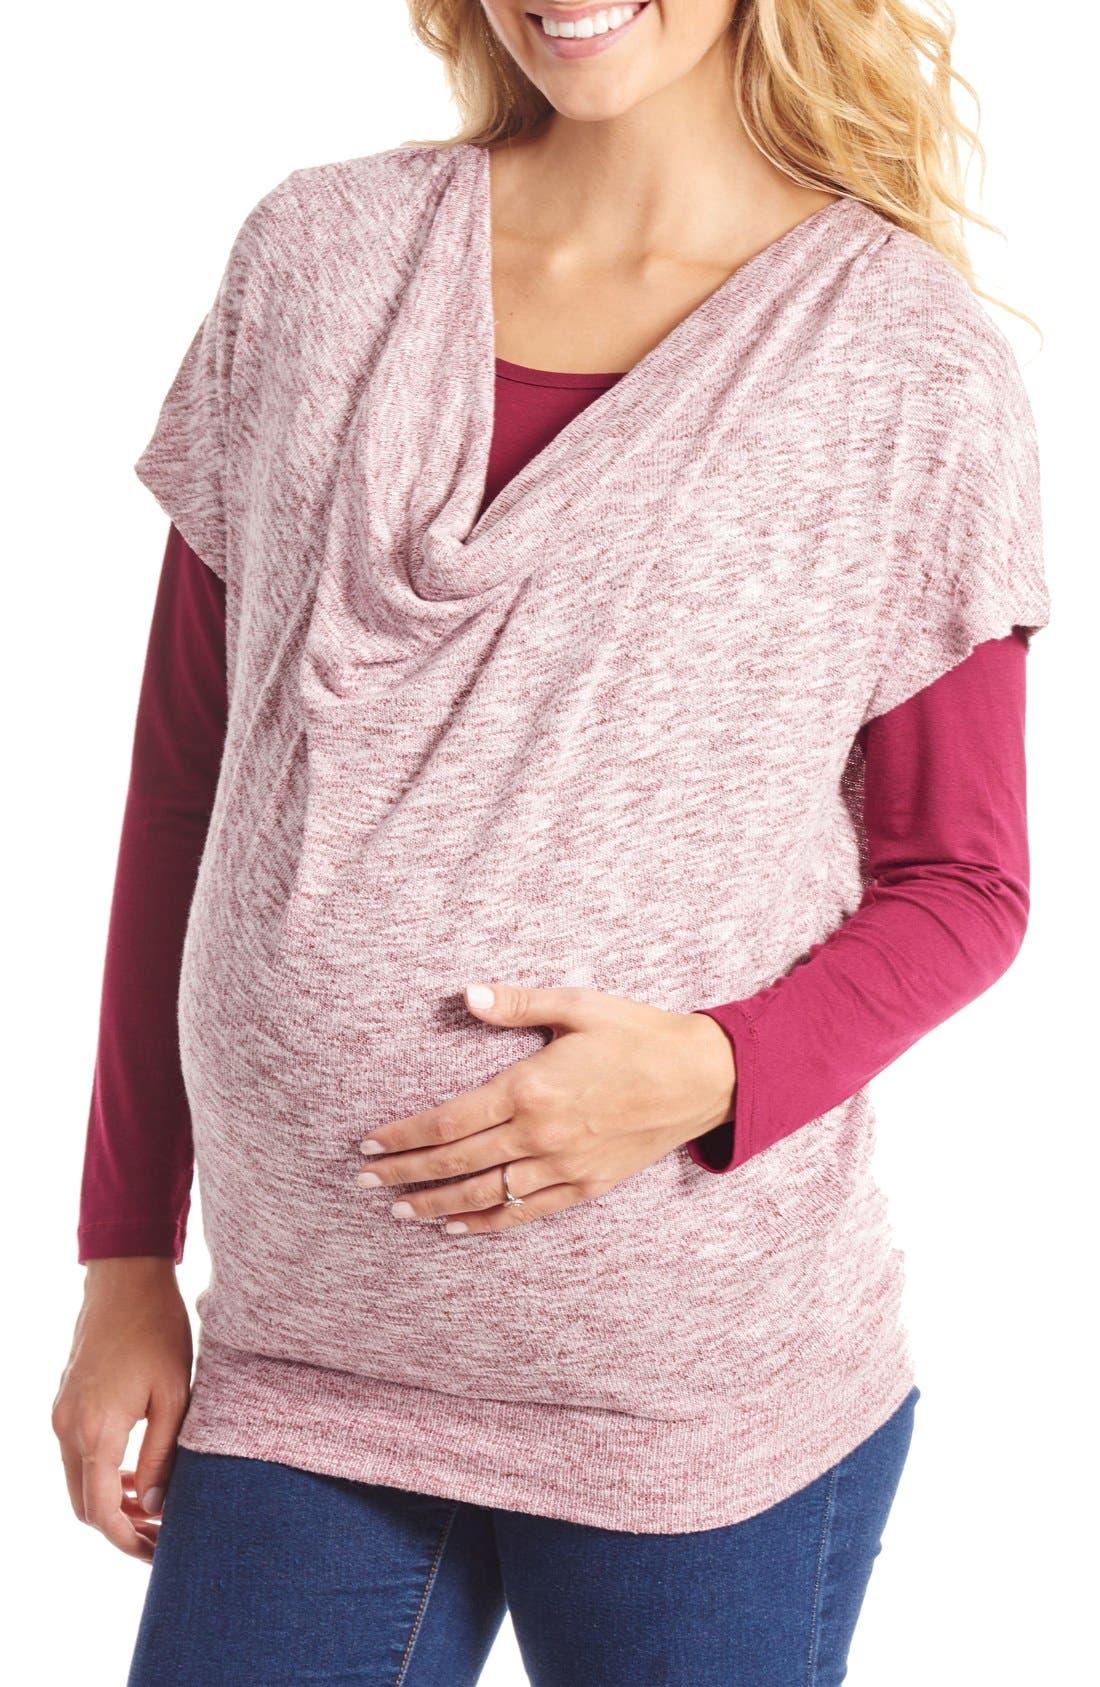 Main Image - Everly Grey 2-Piece Maternity/Nursing Top